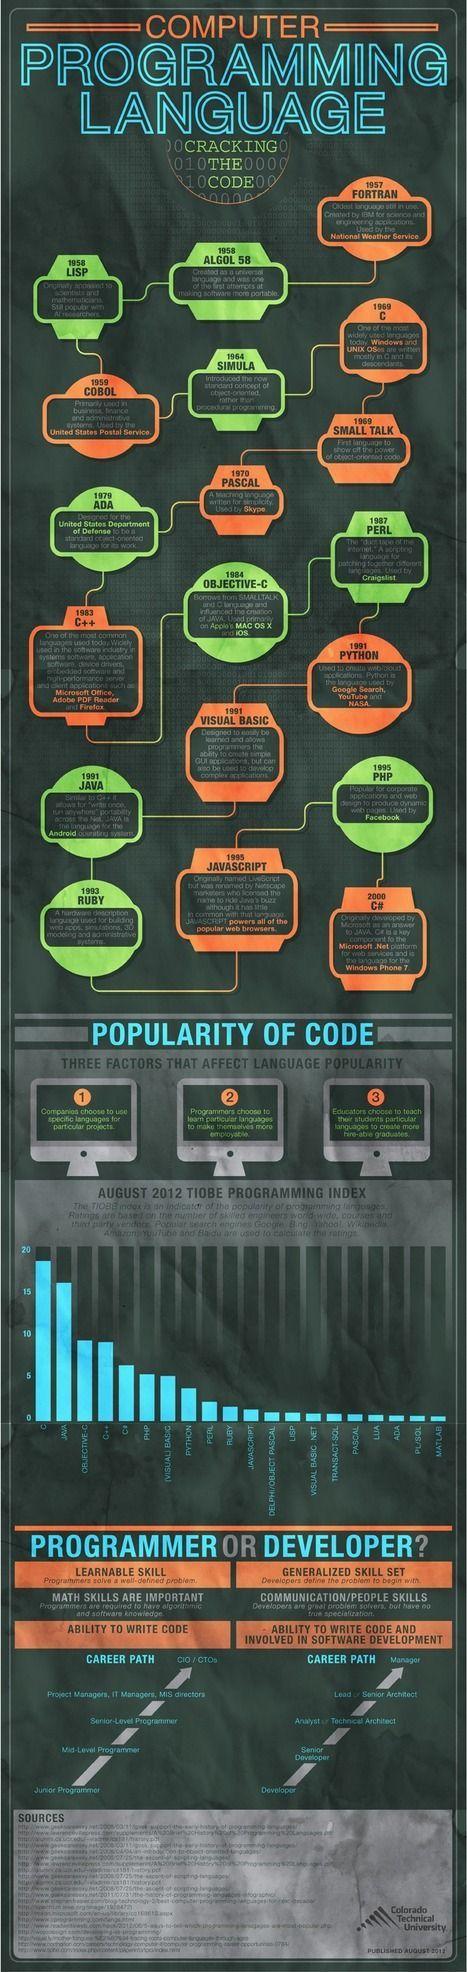 Computer Programming Language Infographic | Tech Revolution 3.0 | Scoop.it